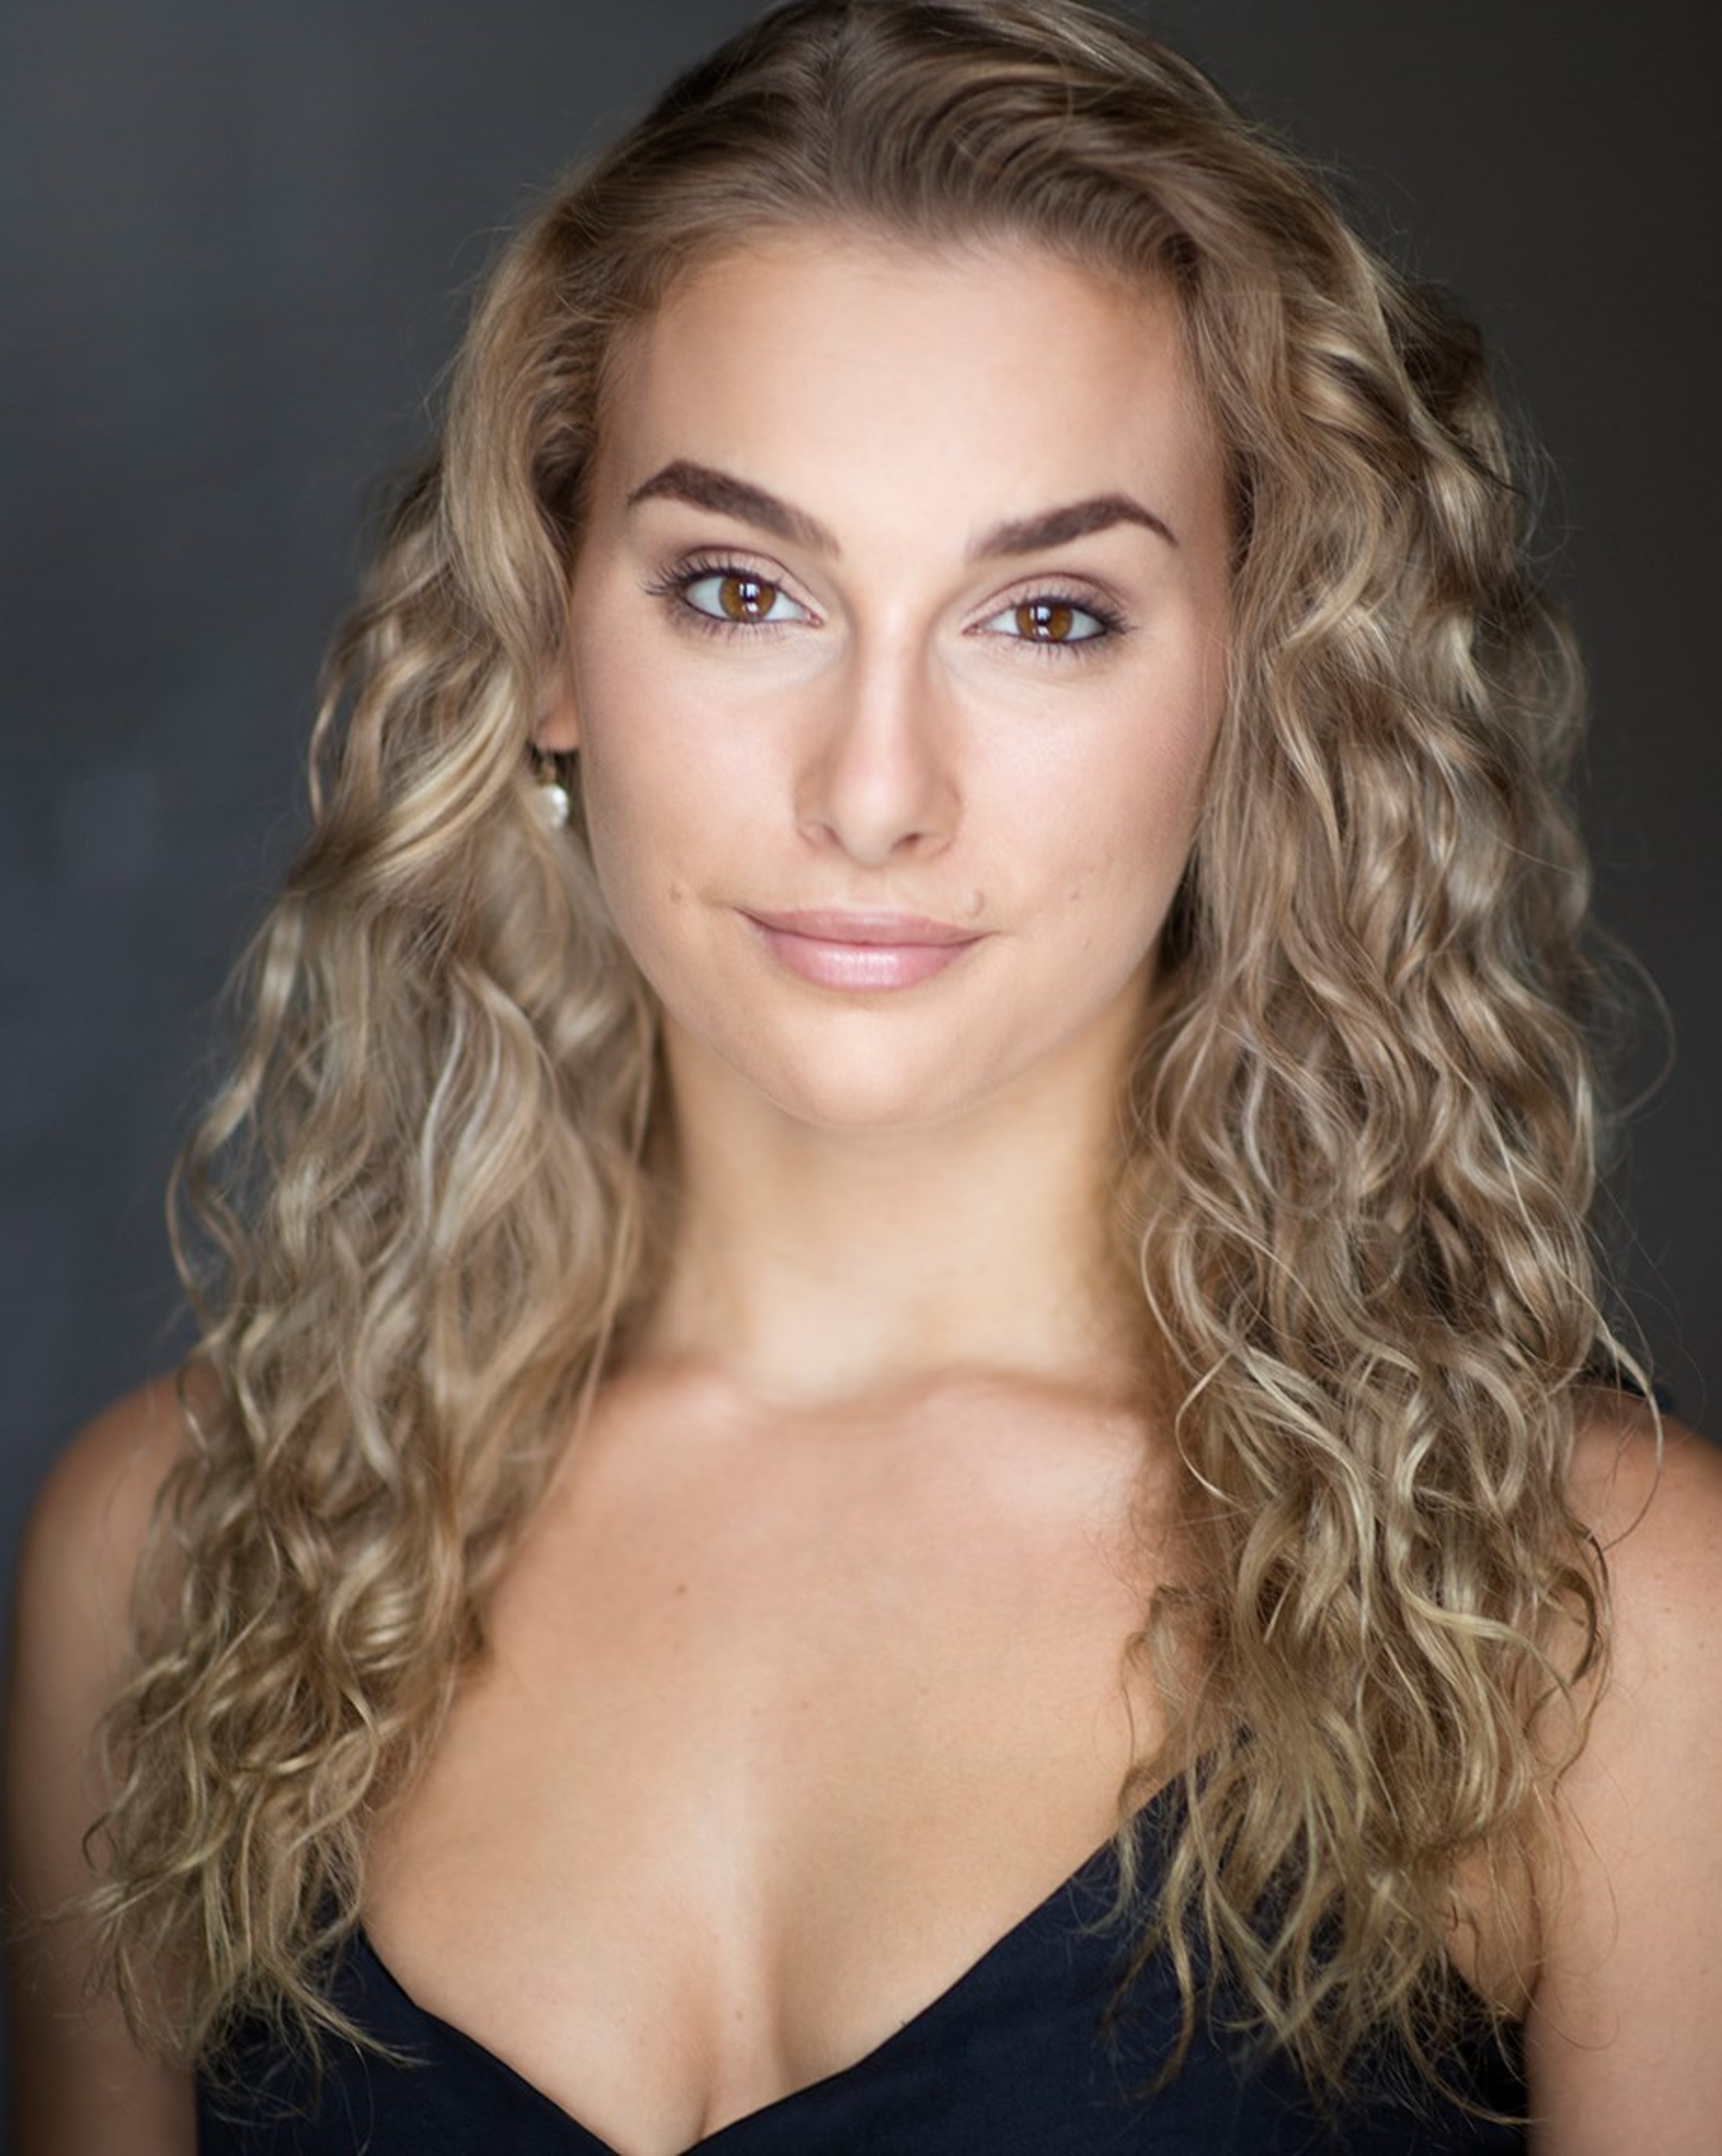 Sasha Kendall